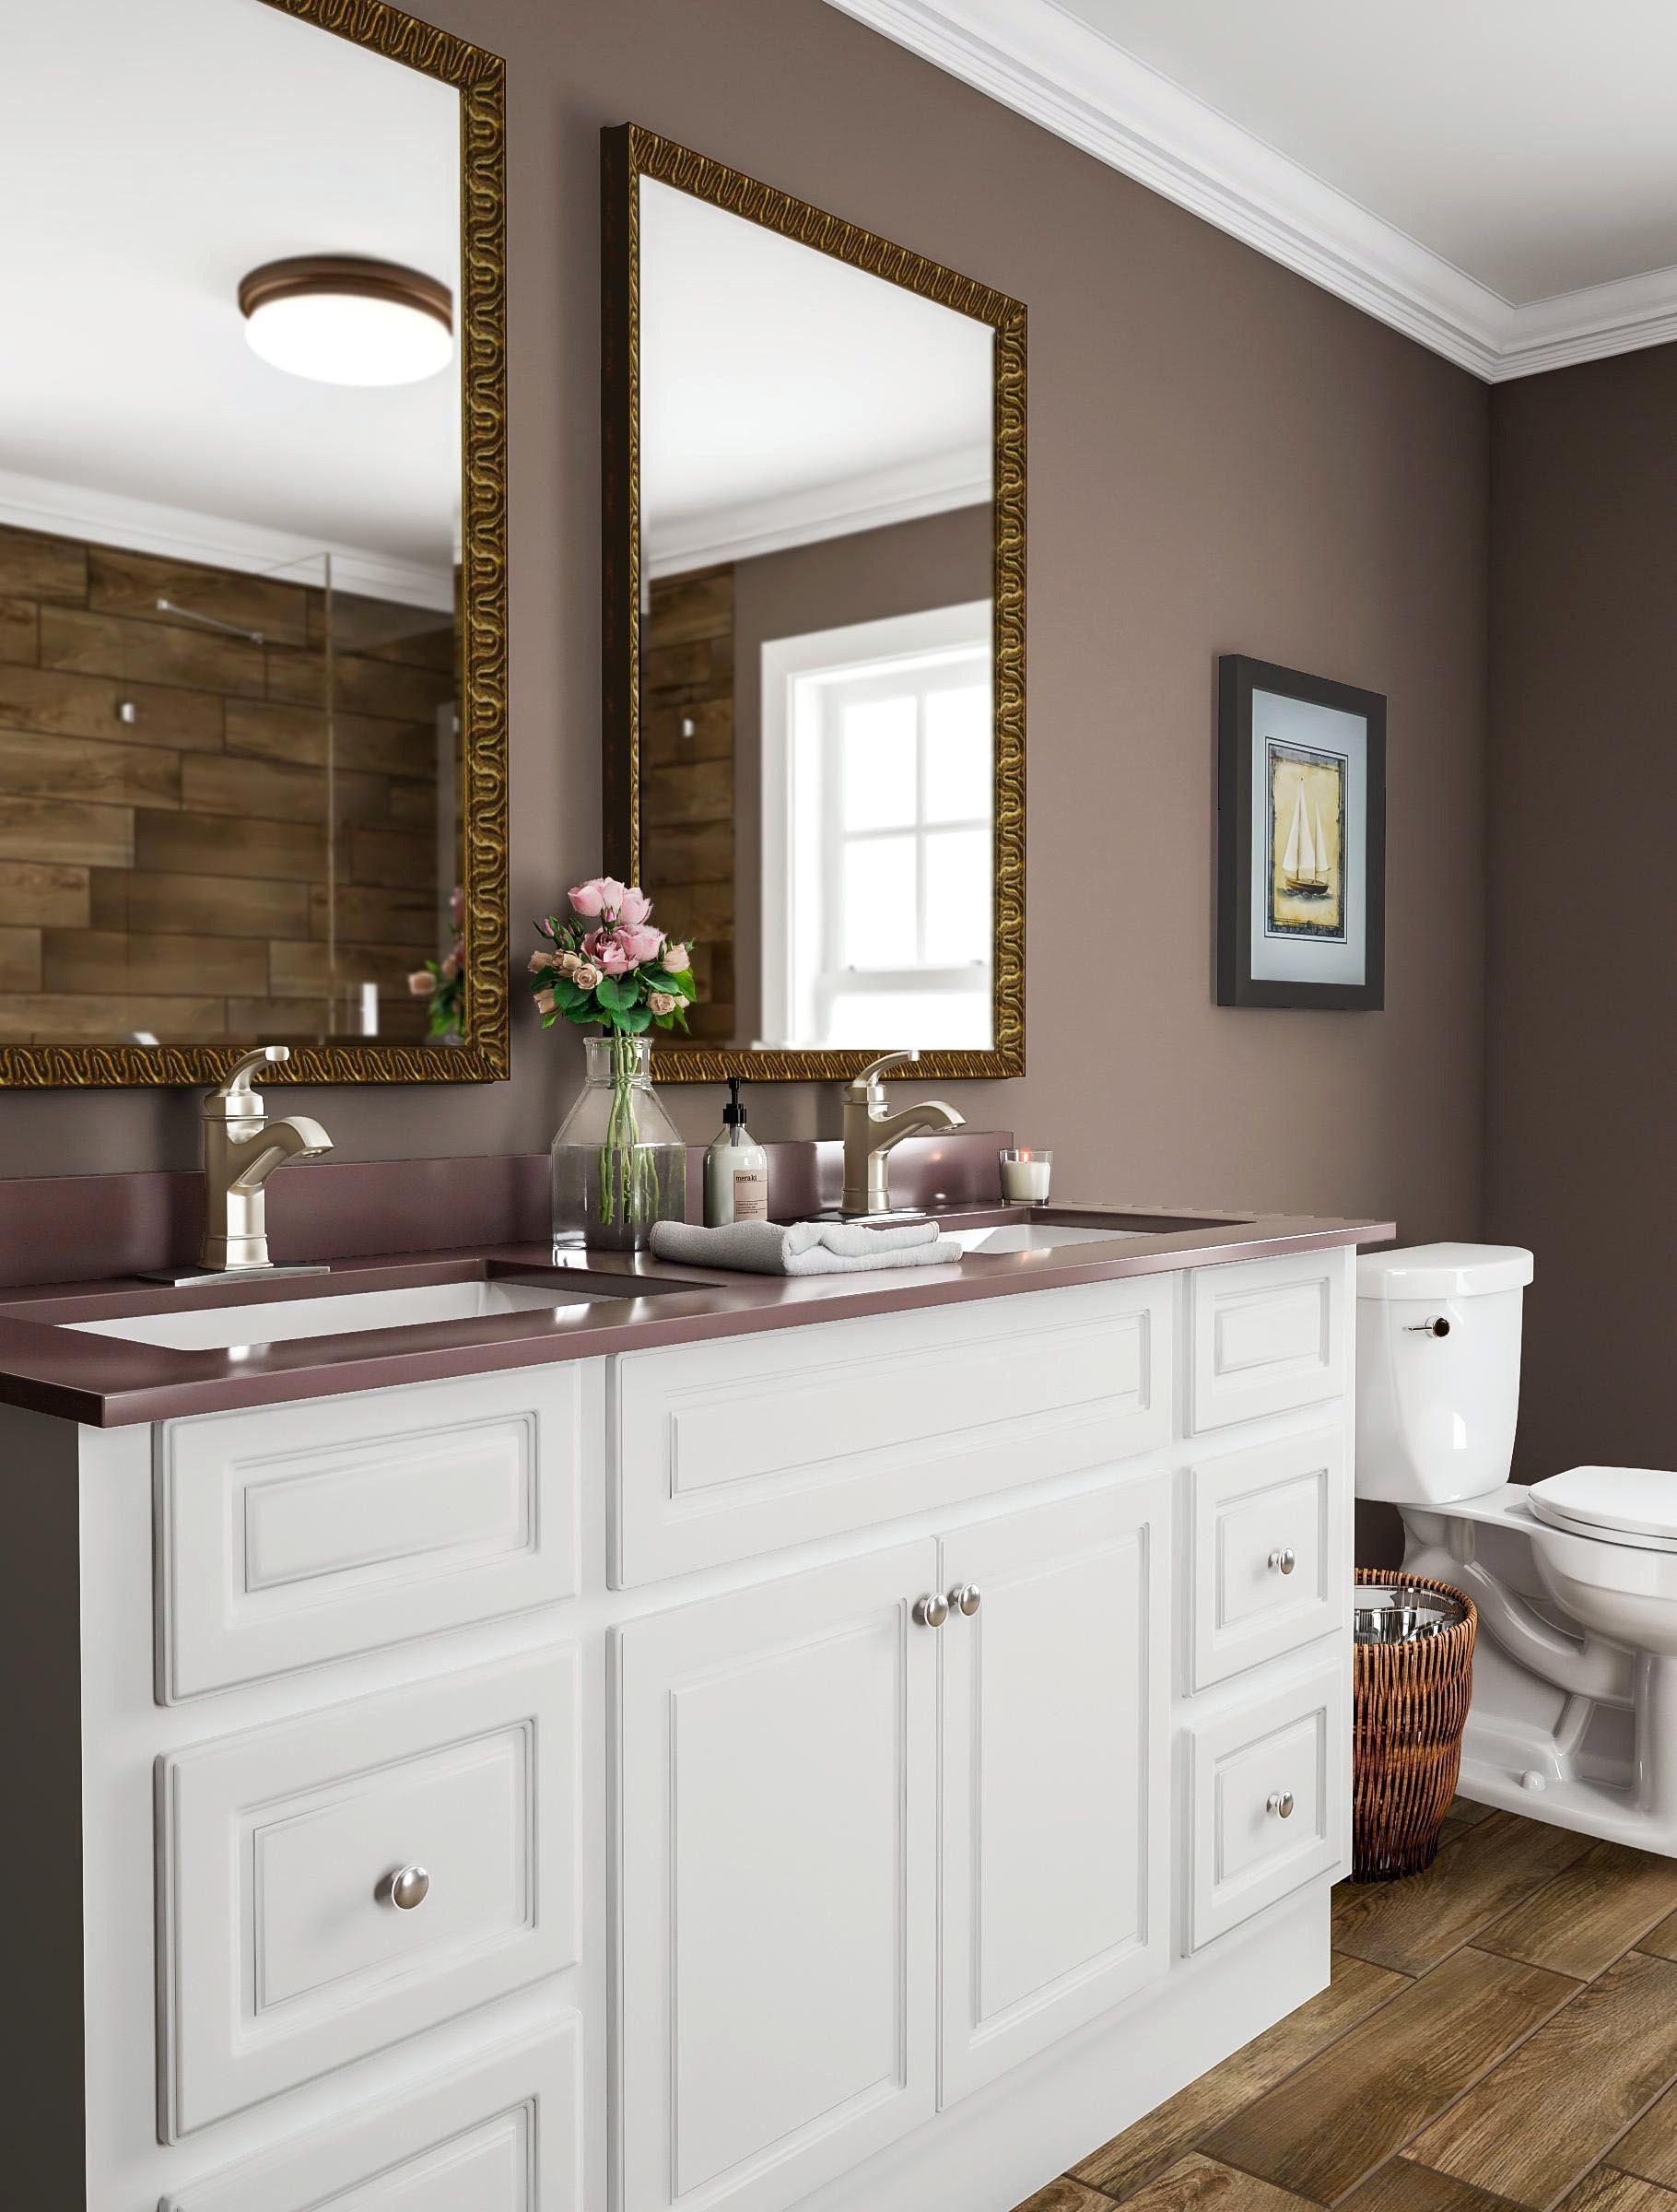 brown bathroom paint colors in 2020 bathroom color on interior paint scheme ideas id=59097